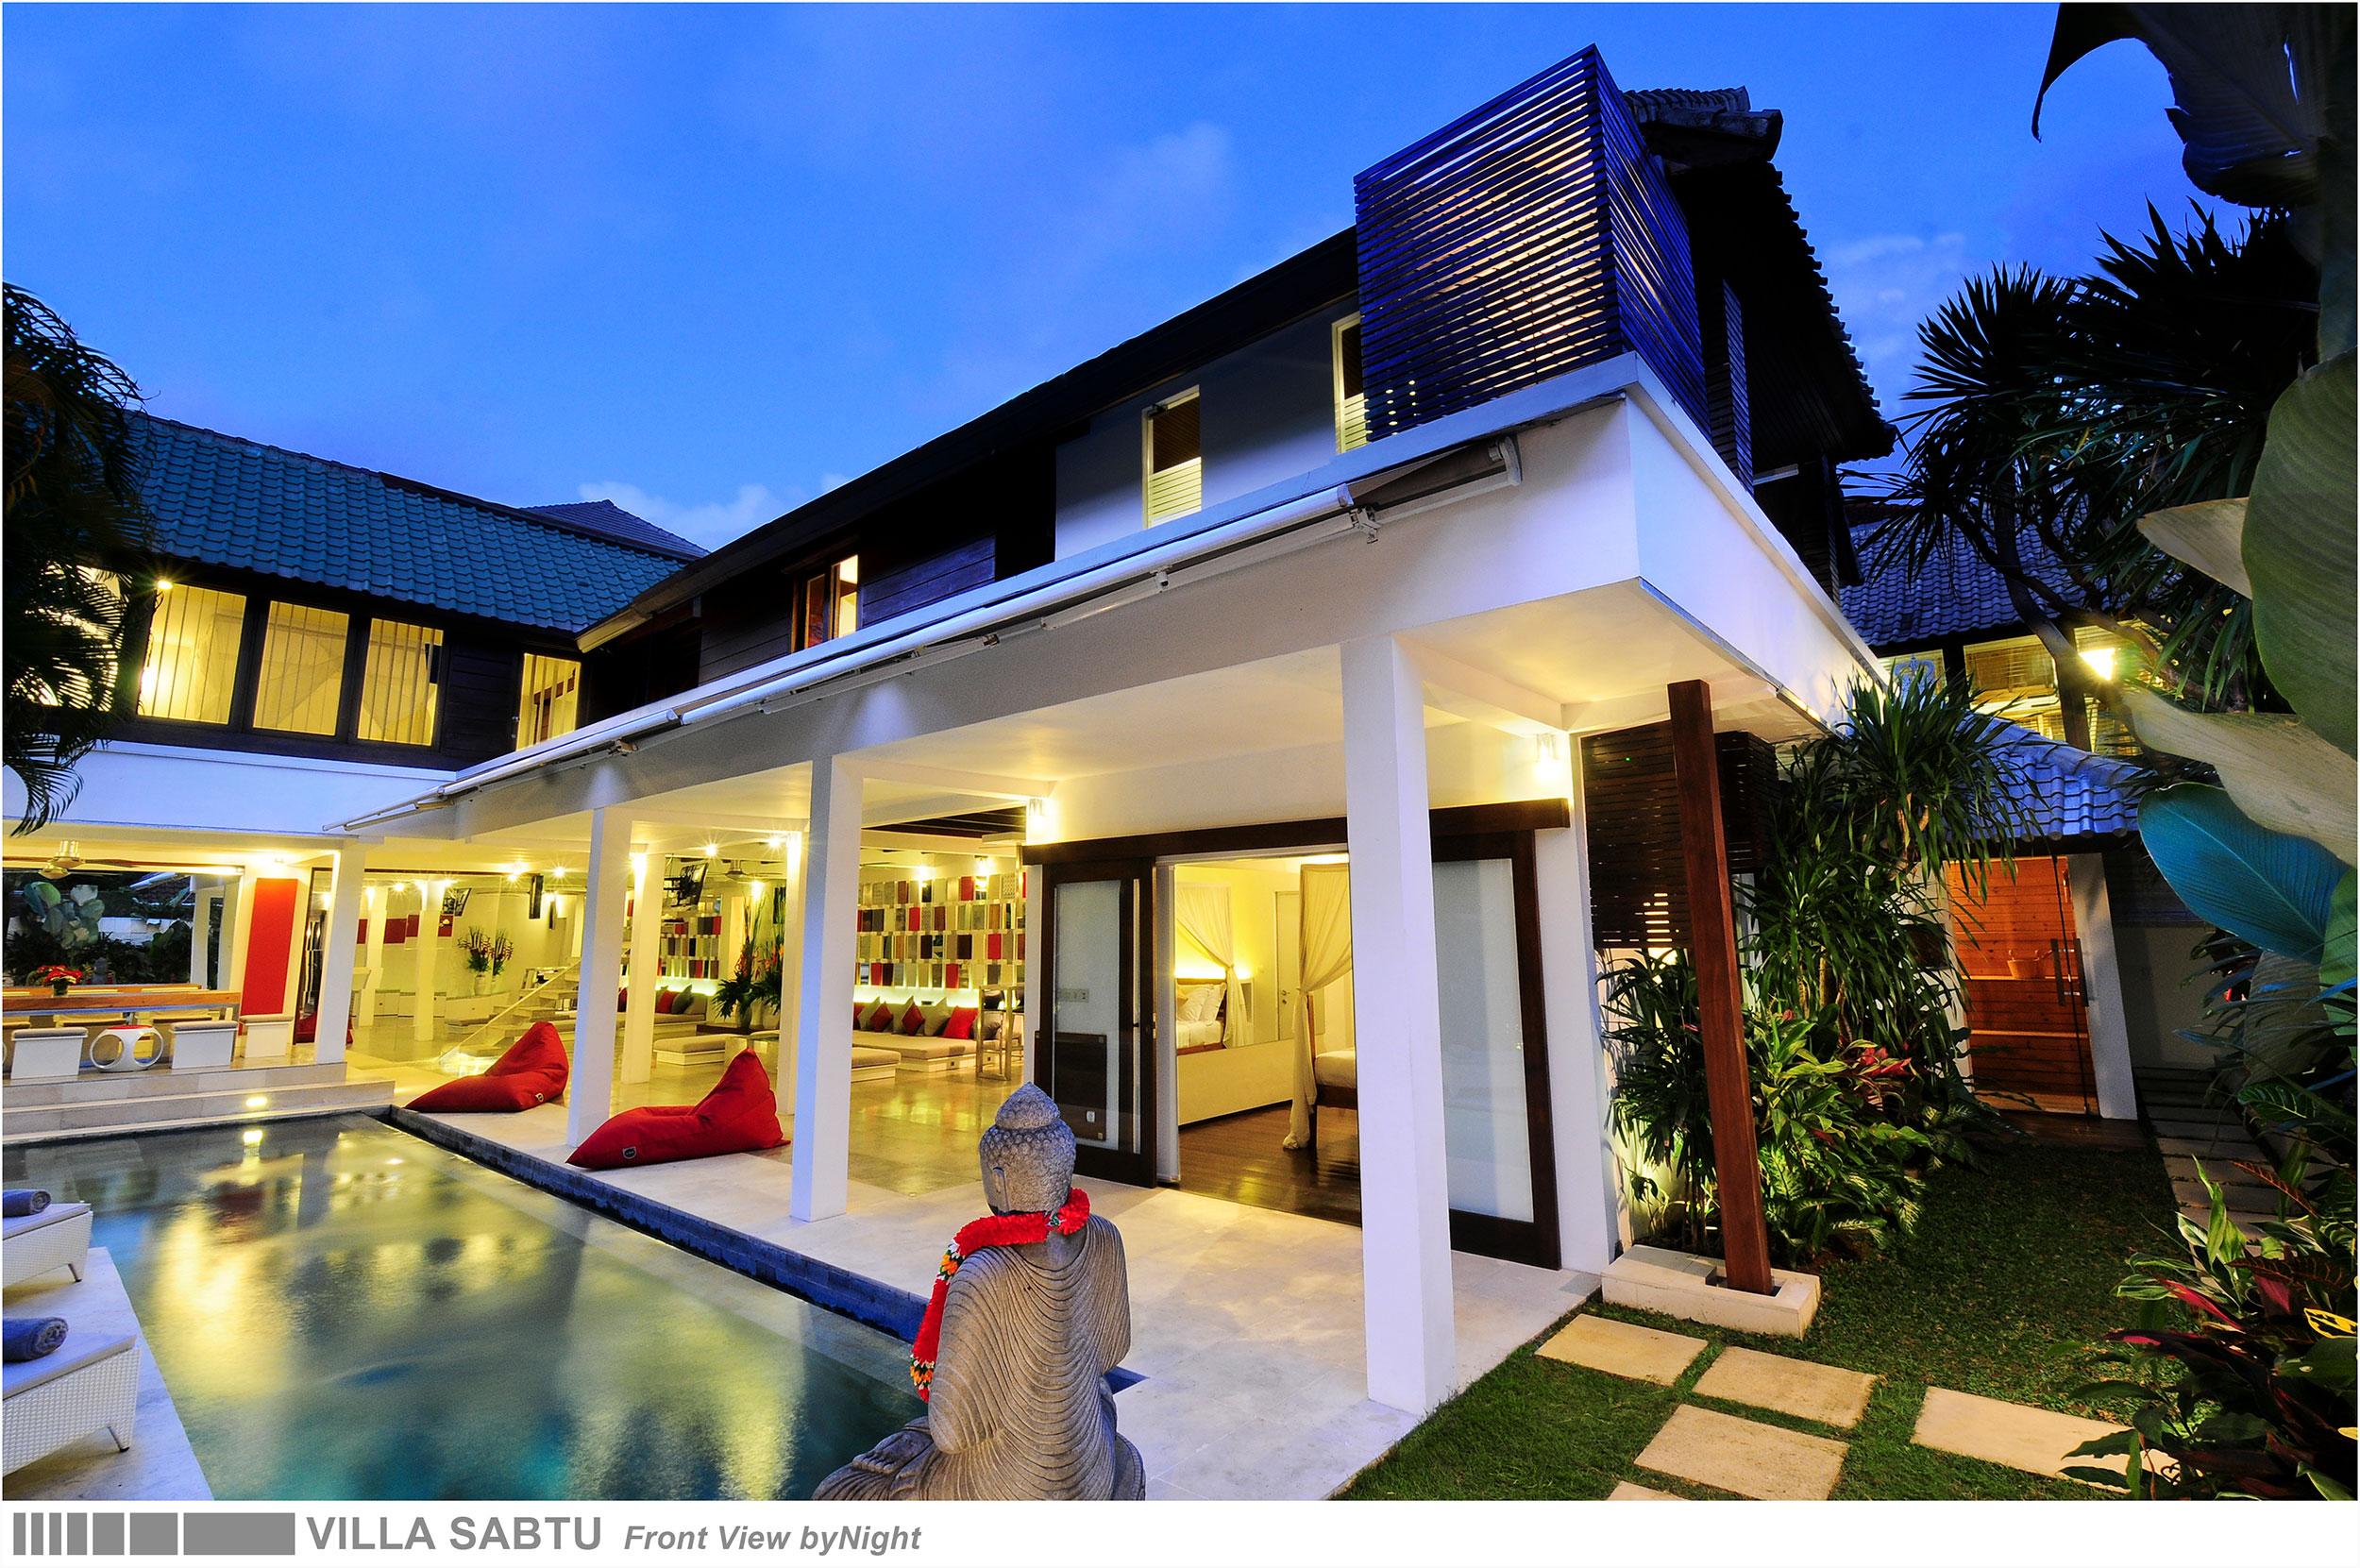 5 bedroom - 04 - villa sabtu - villa in seminyak